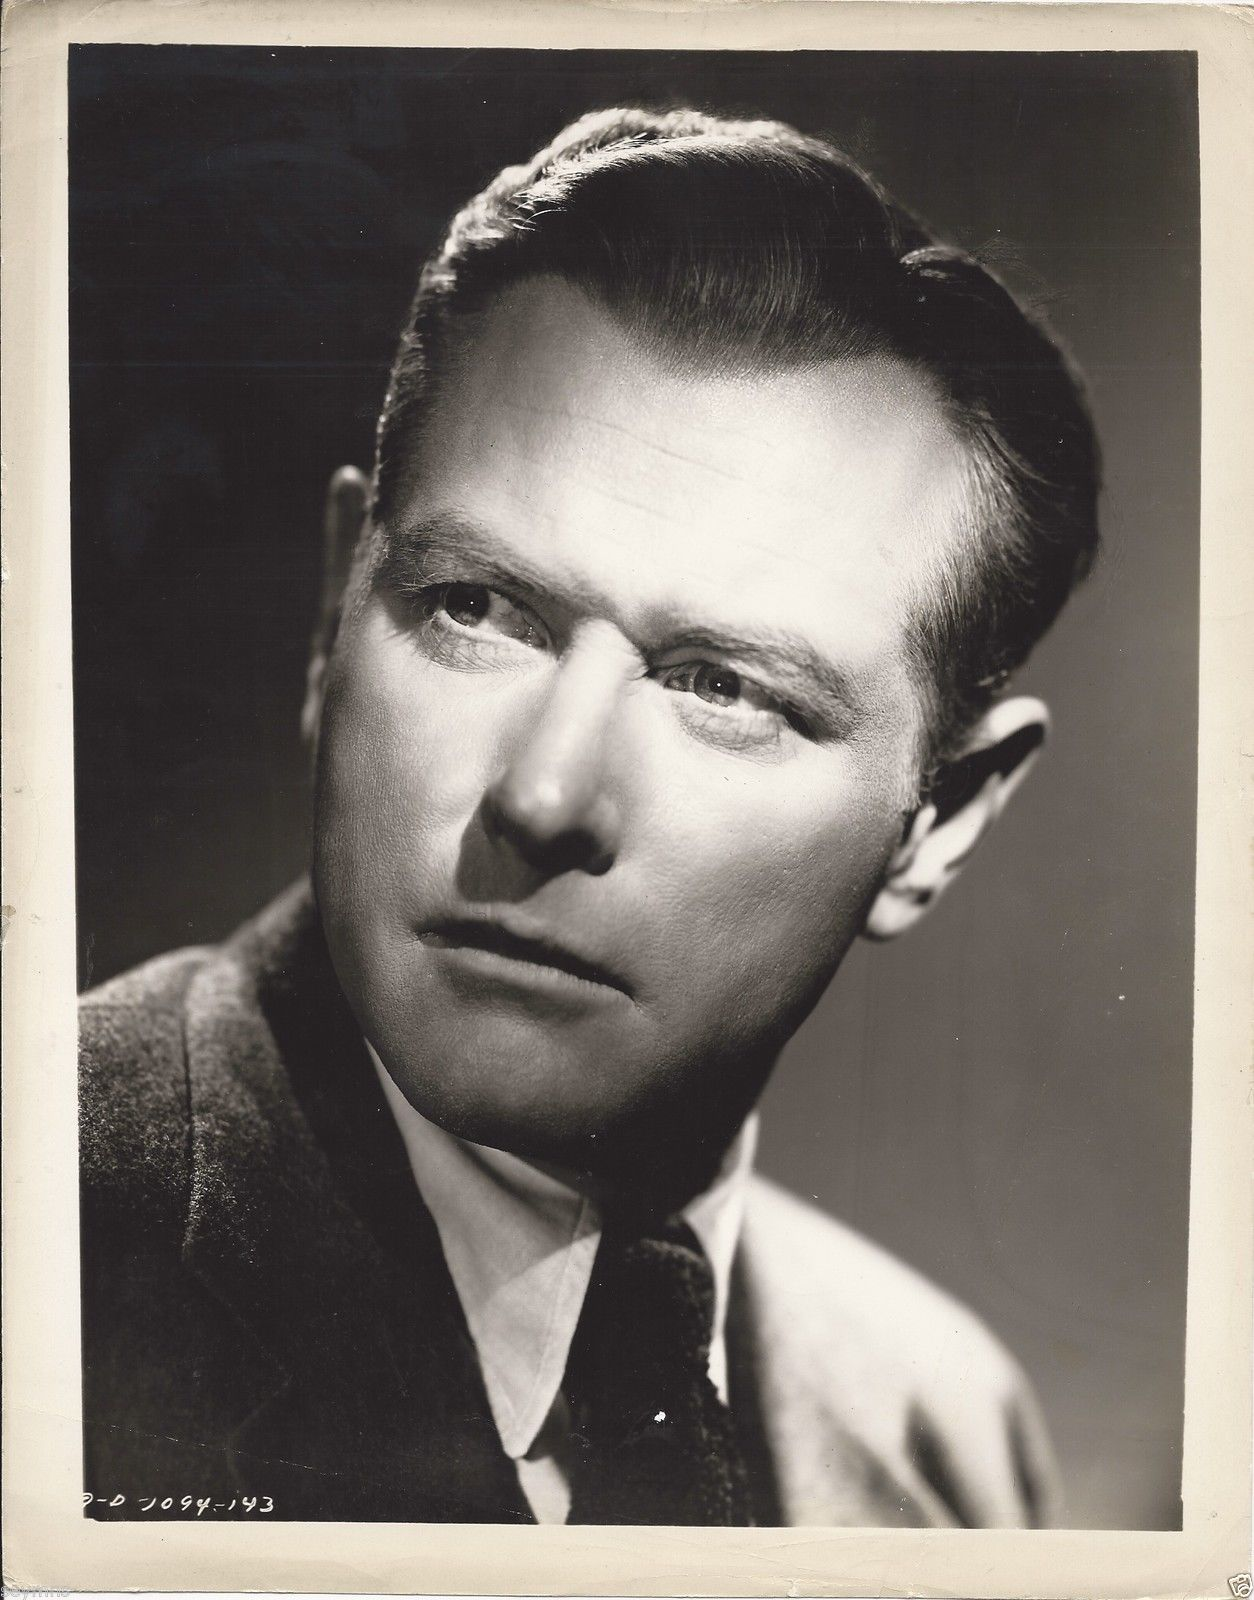 George Macready salary